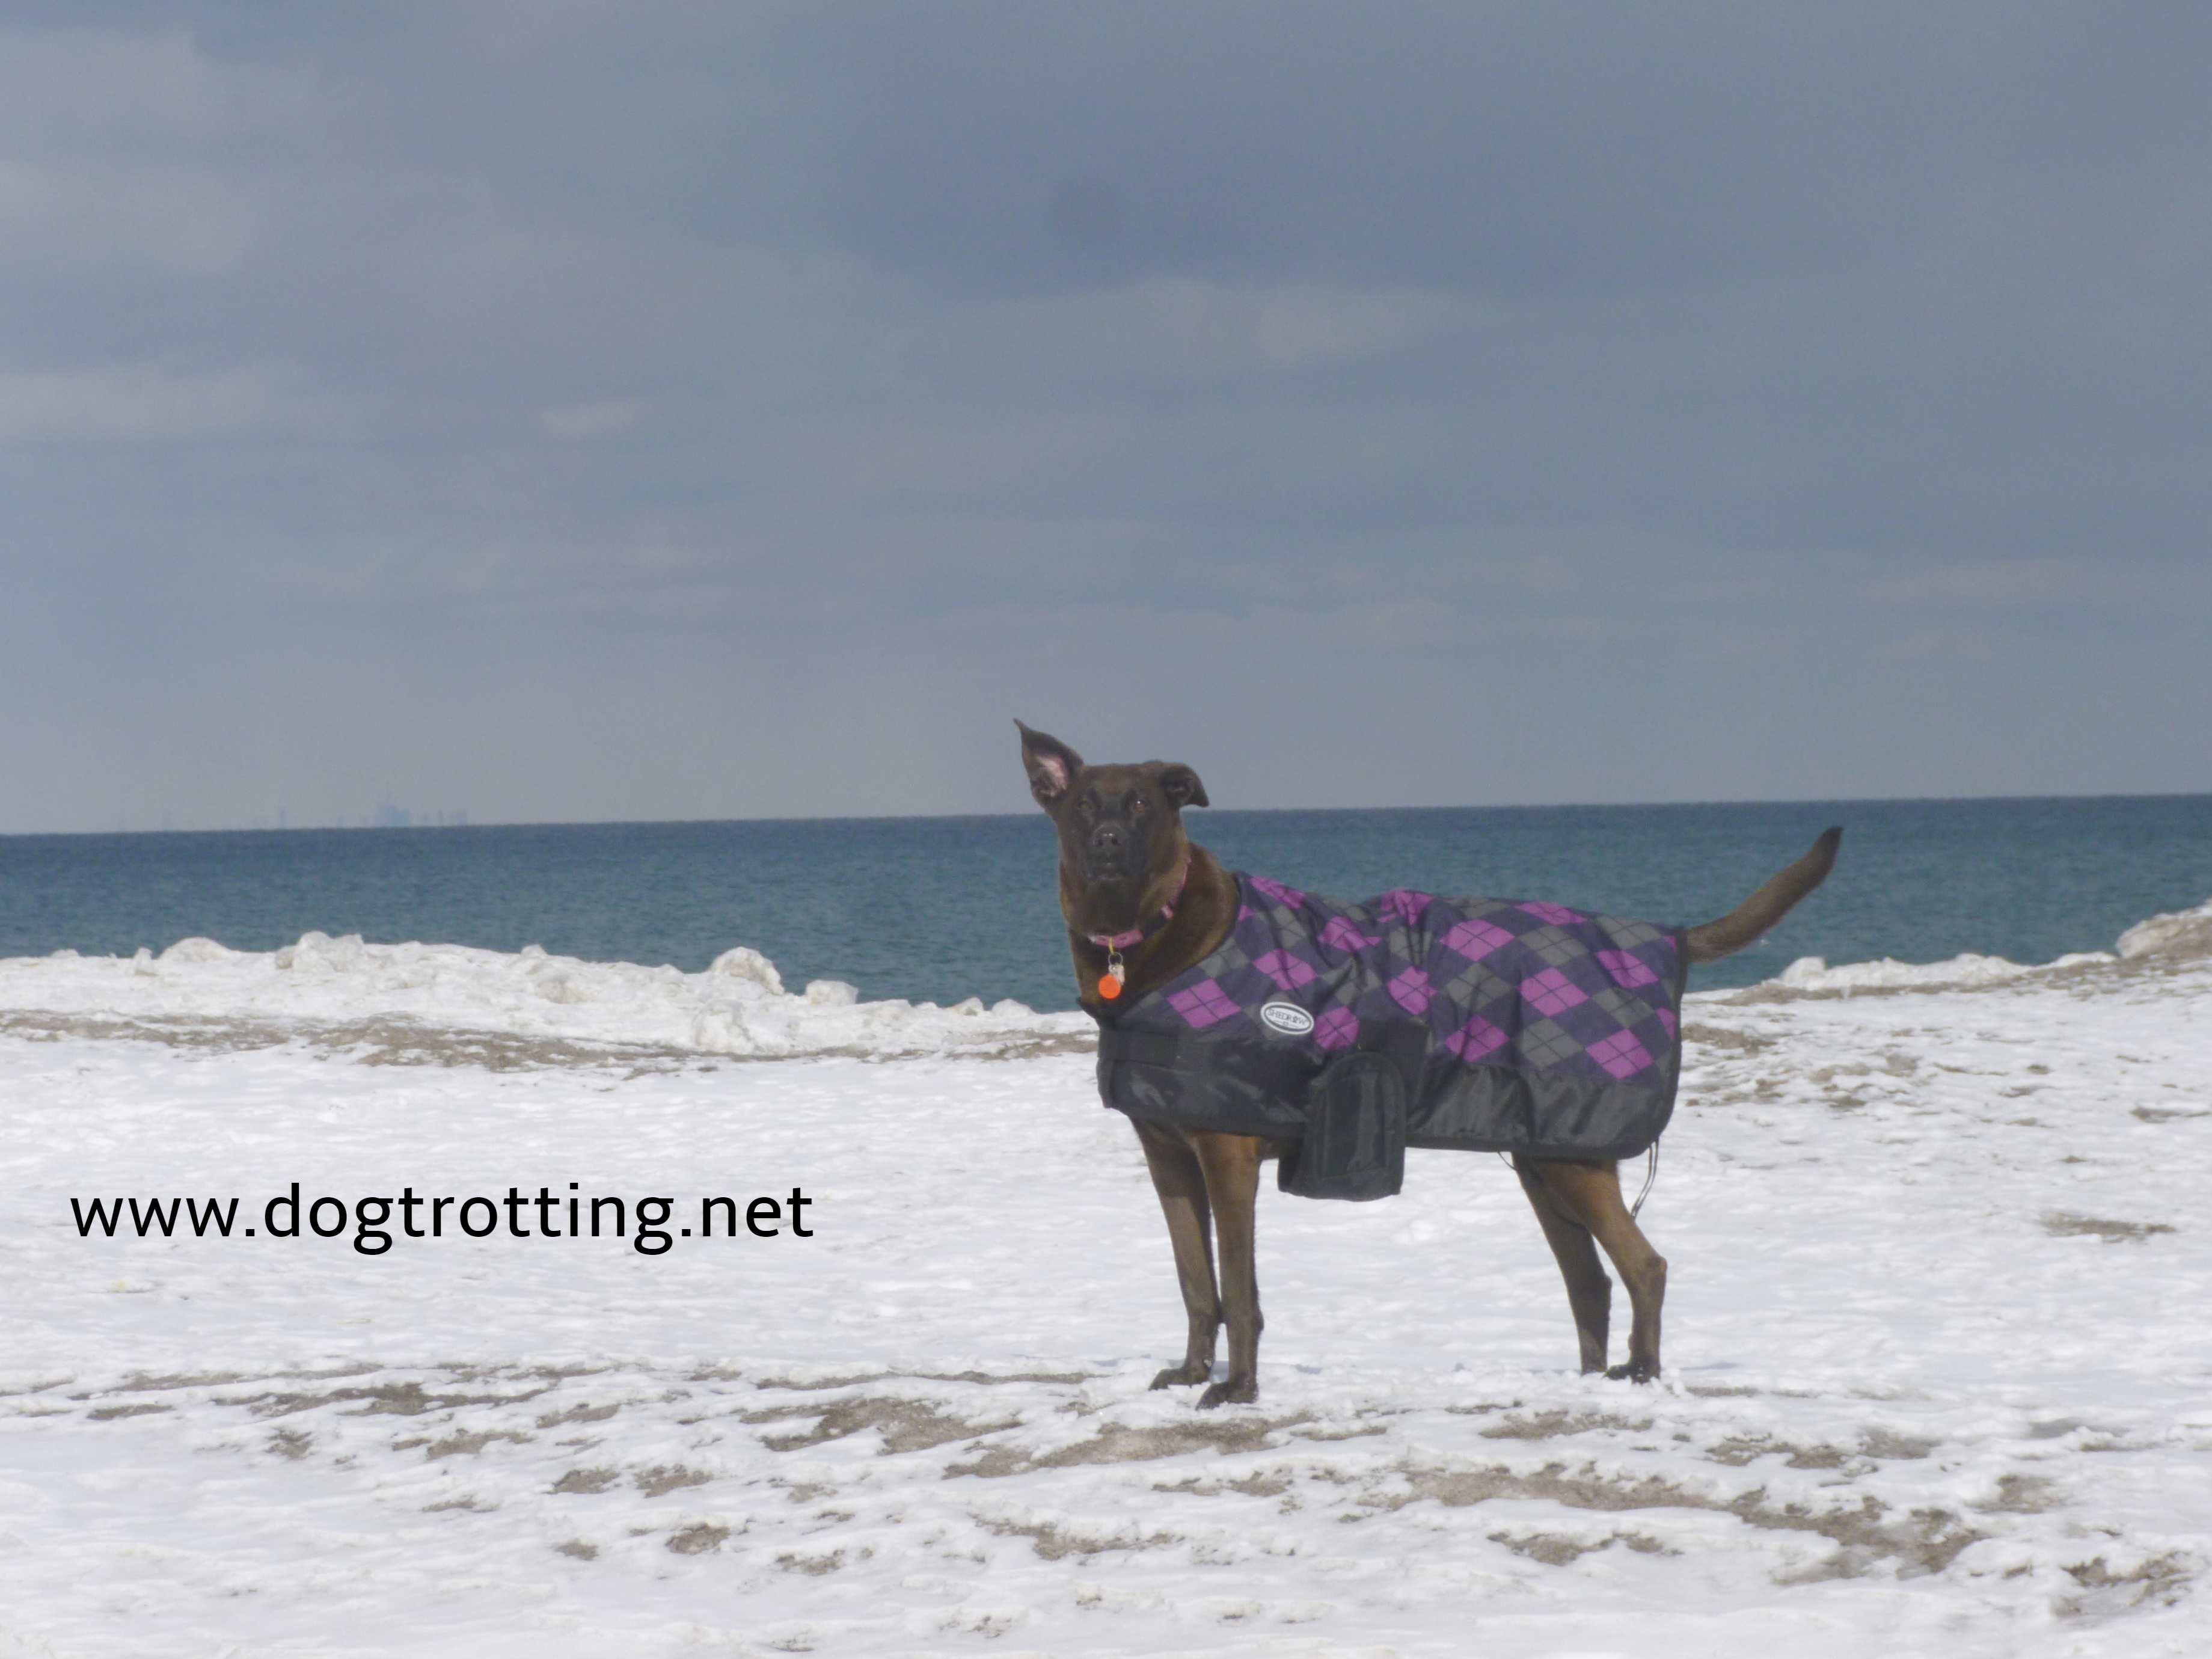 dog on the beach winter